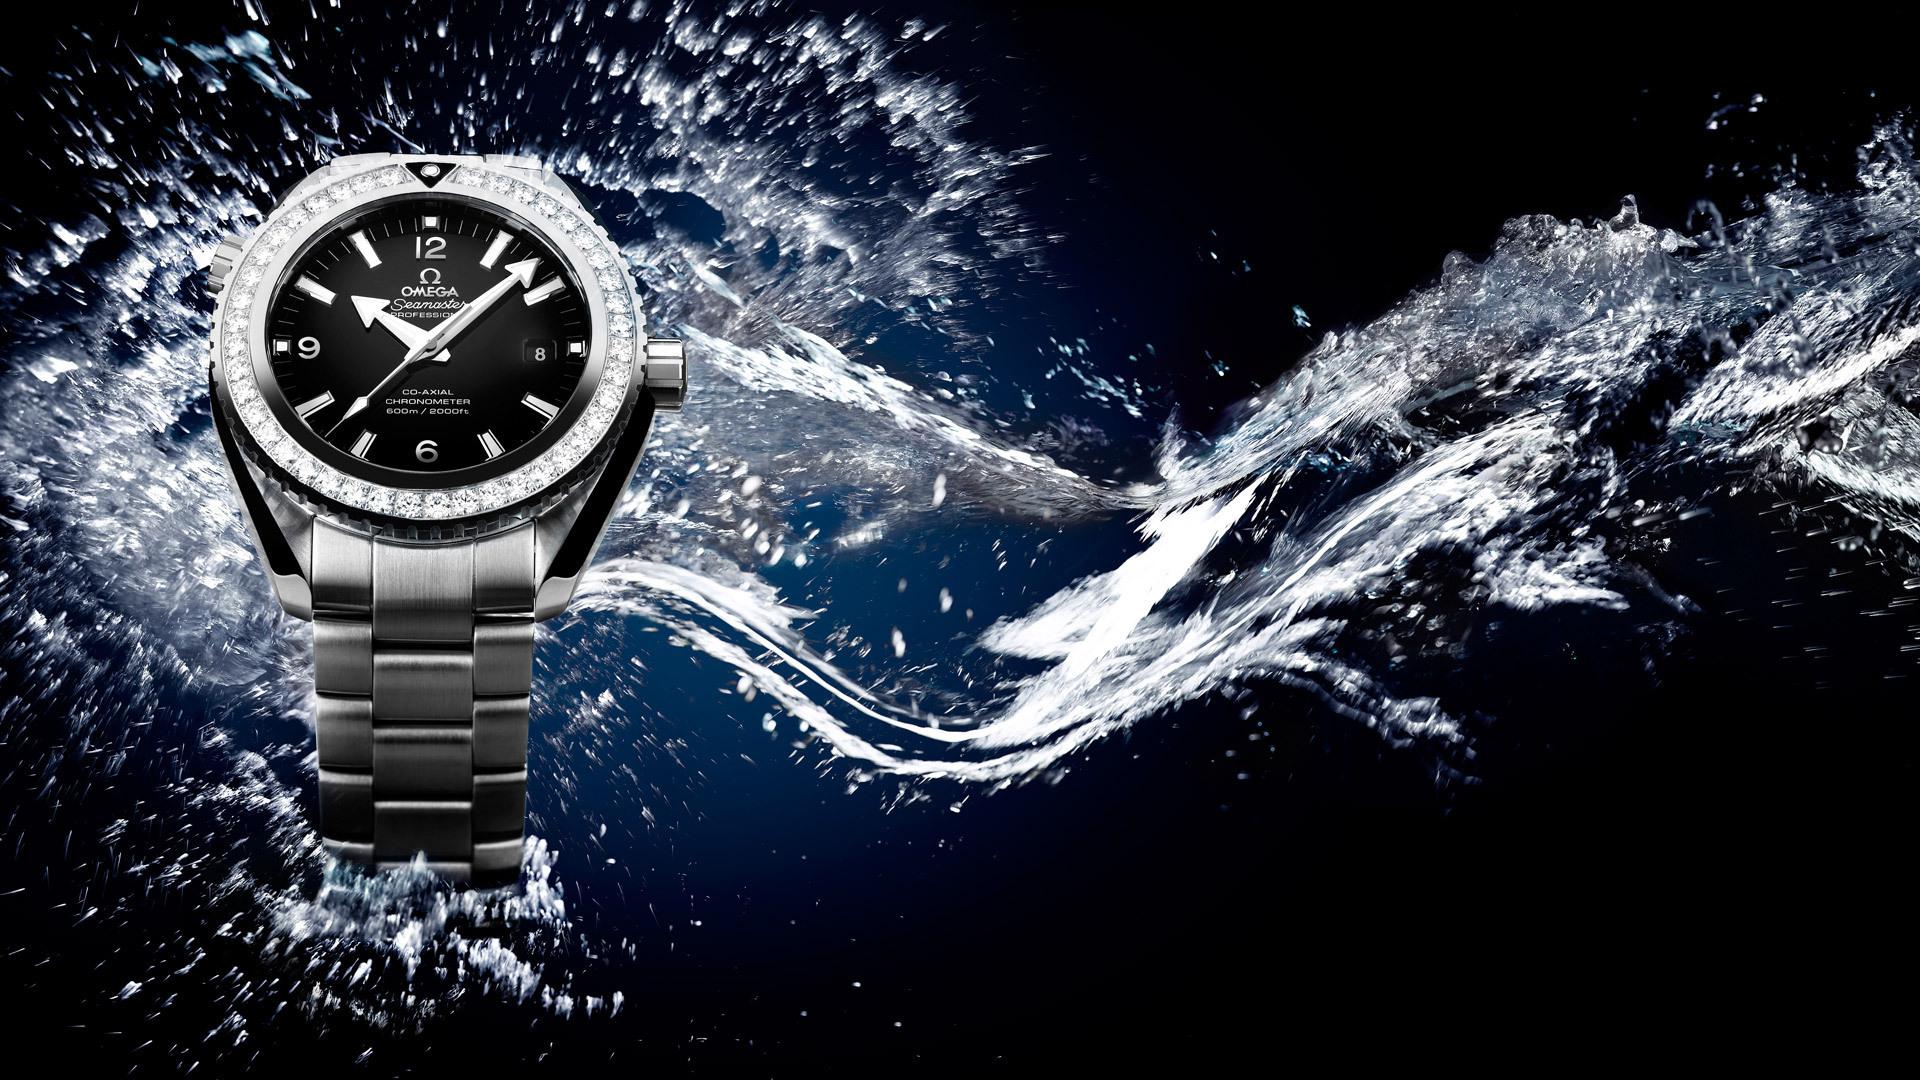 Omega Seamaster Diamond Watch Lifestyle